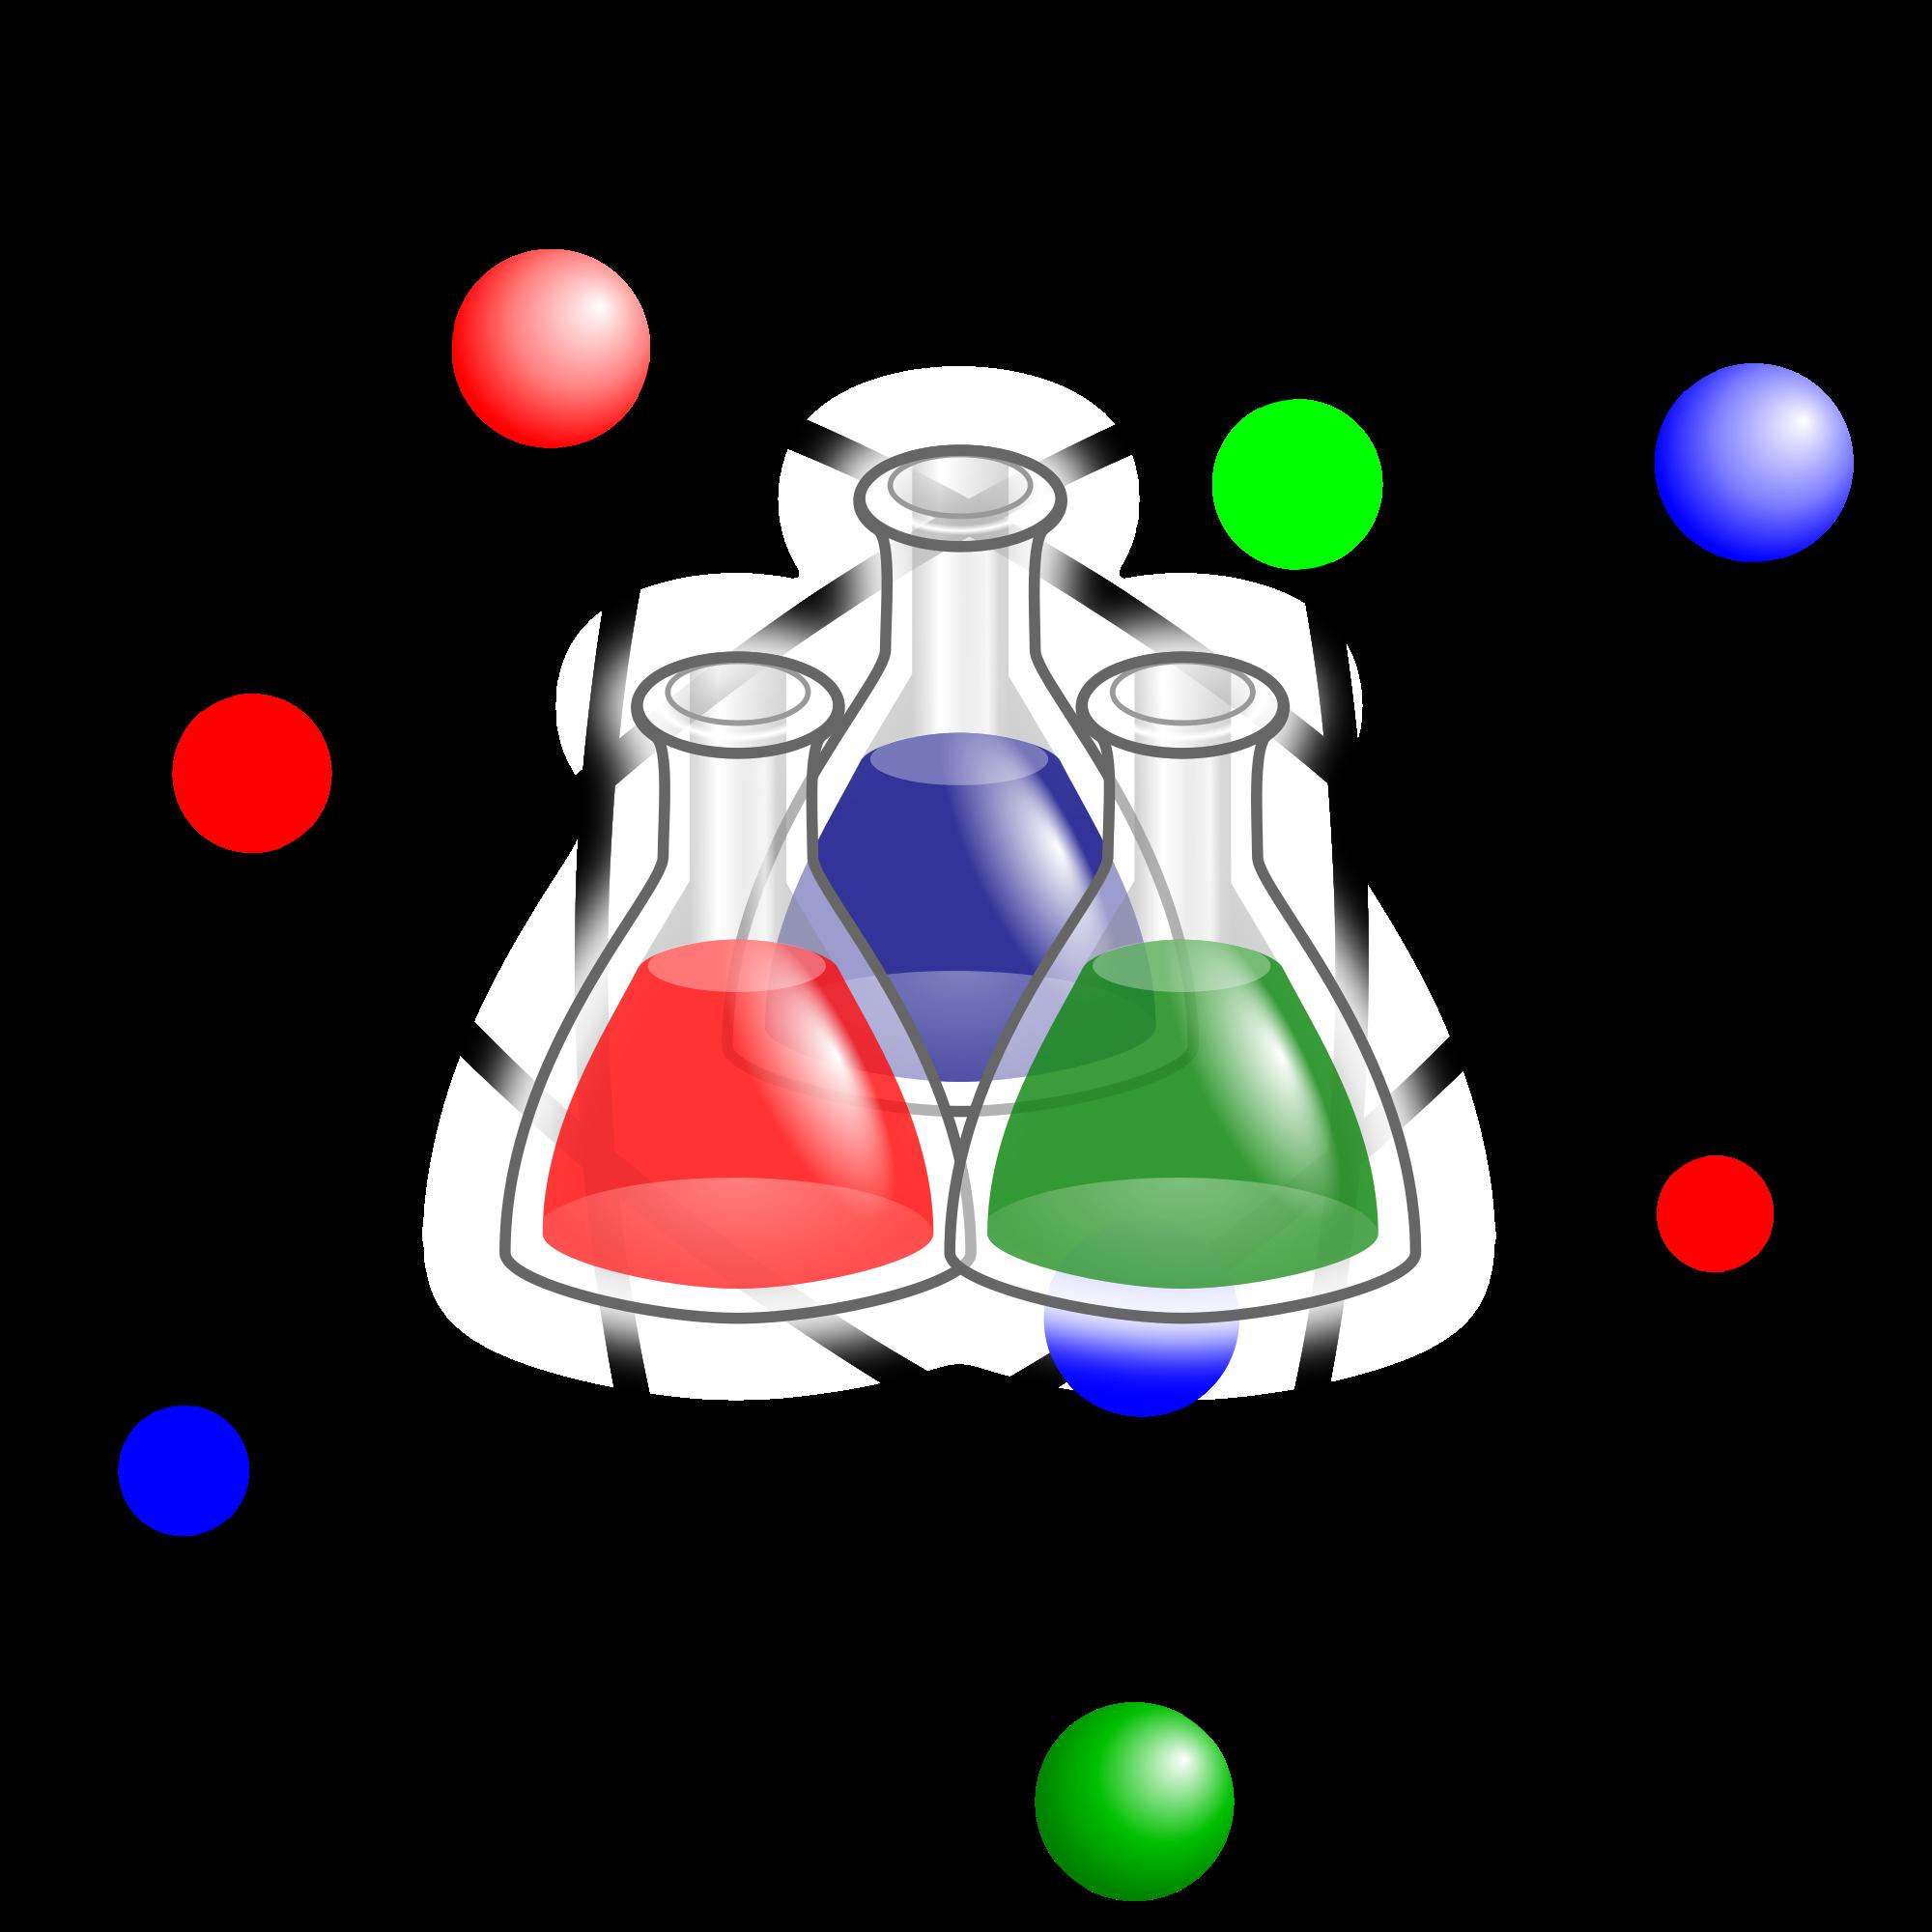 public/science.png